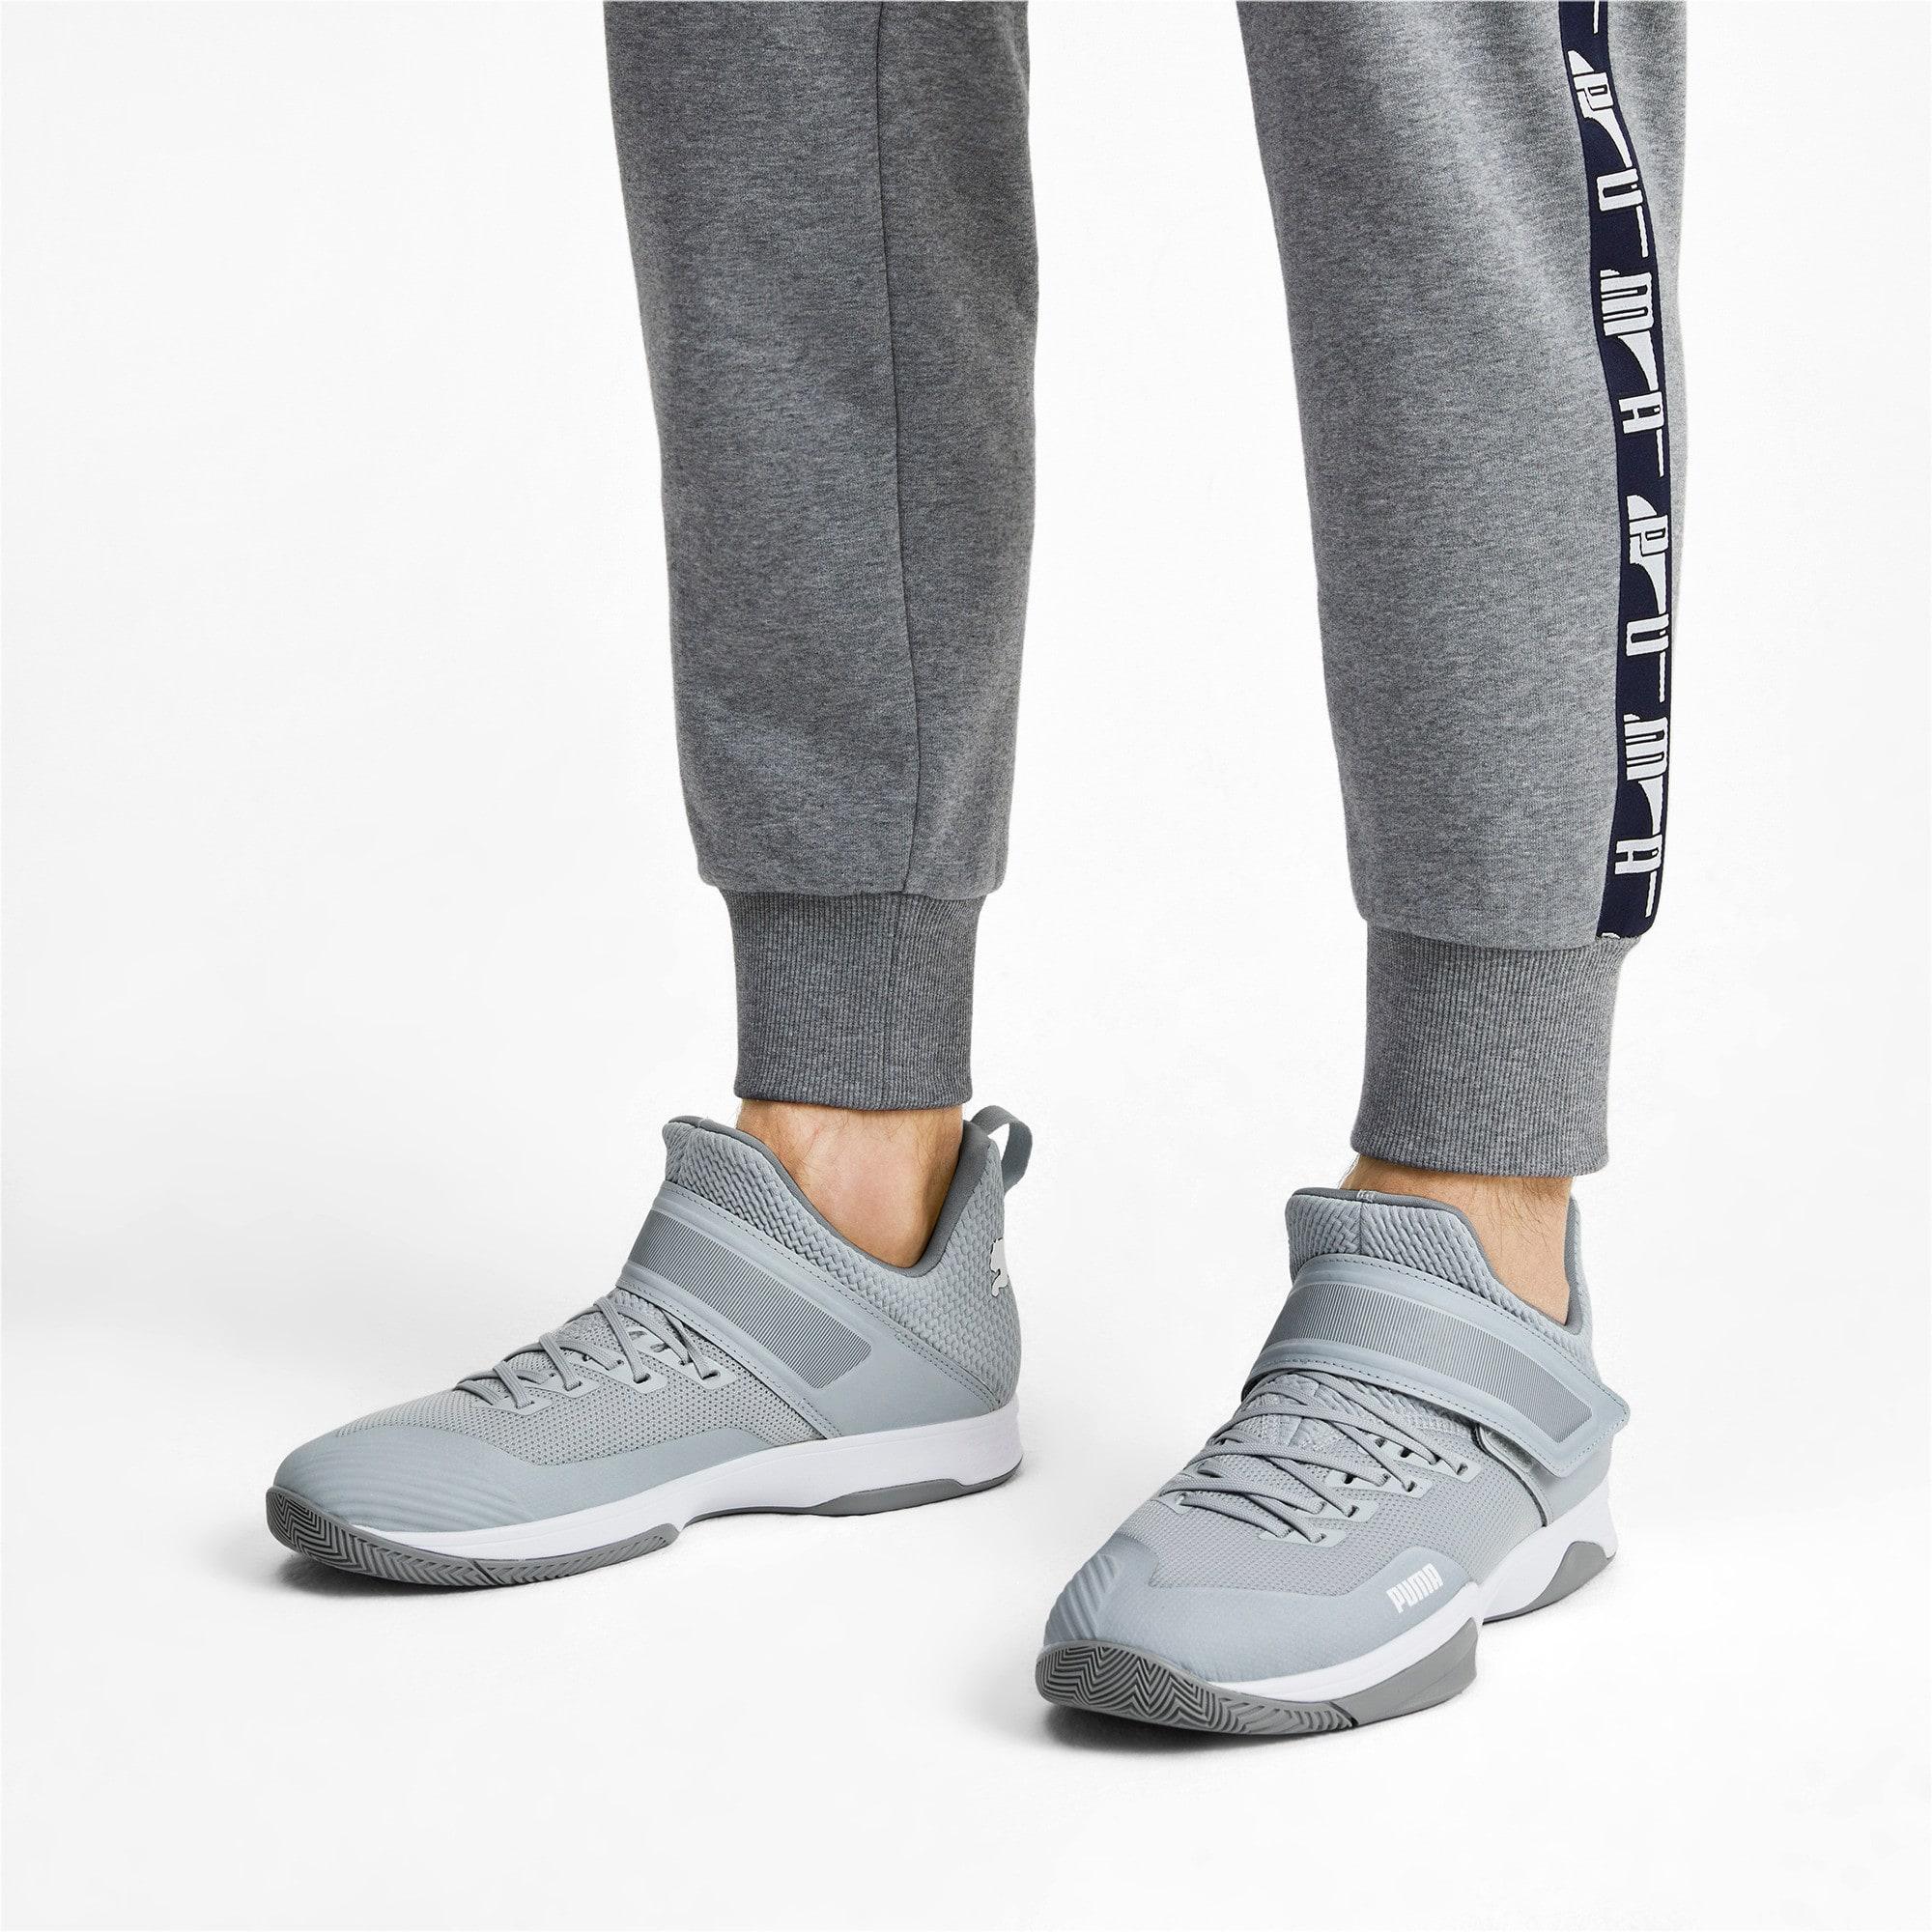 Thumbnail 3 of Rise XT3 Handball Shoes, Grey Dawn-White-Tradewinds, medium-IND